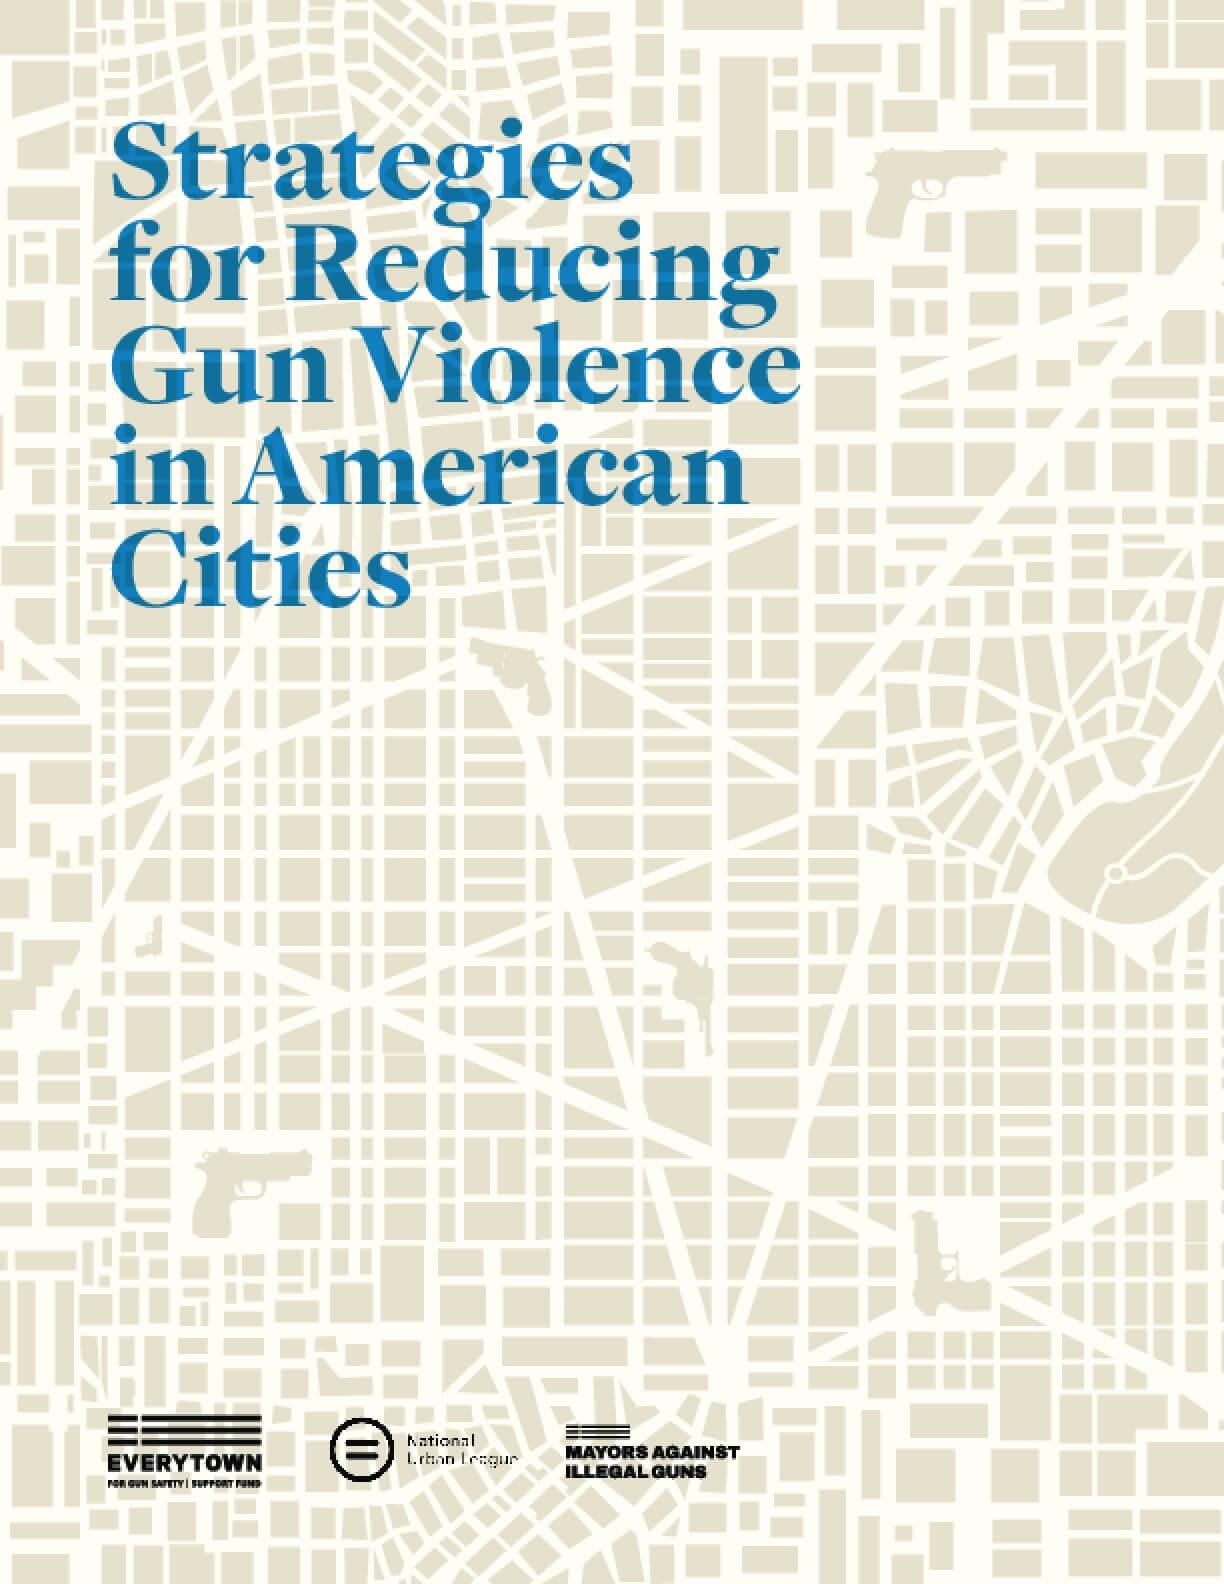 Strategies for Reducing Gun Violence in American Cities